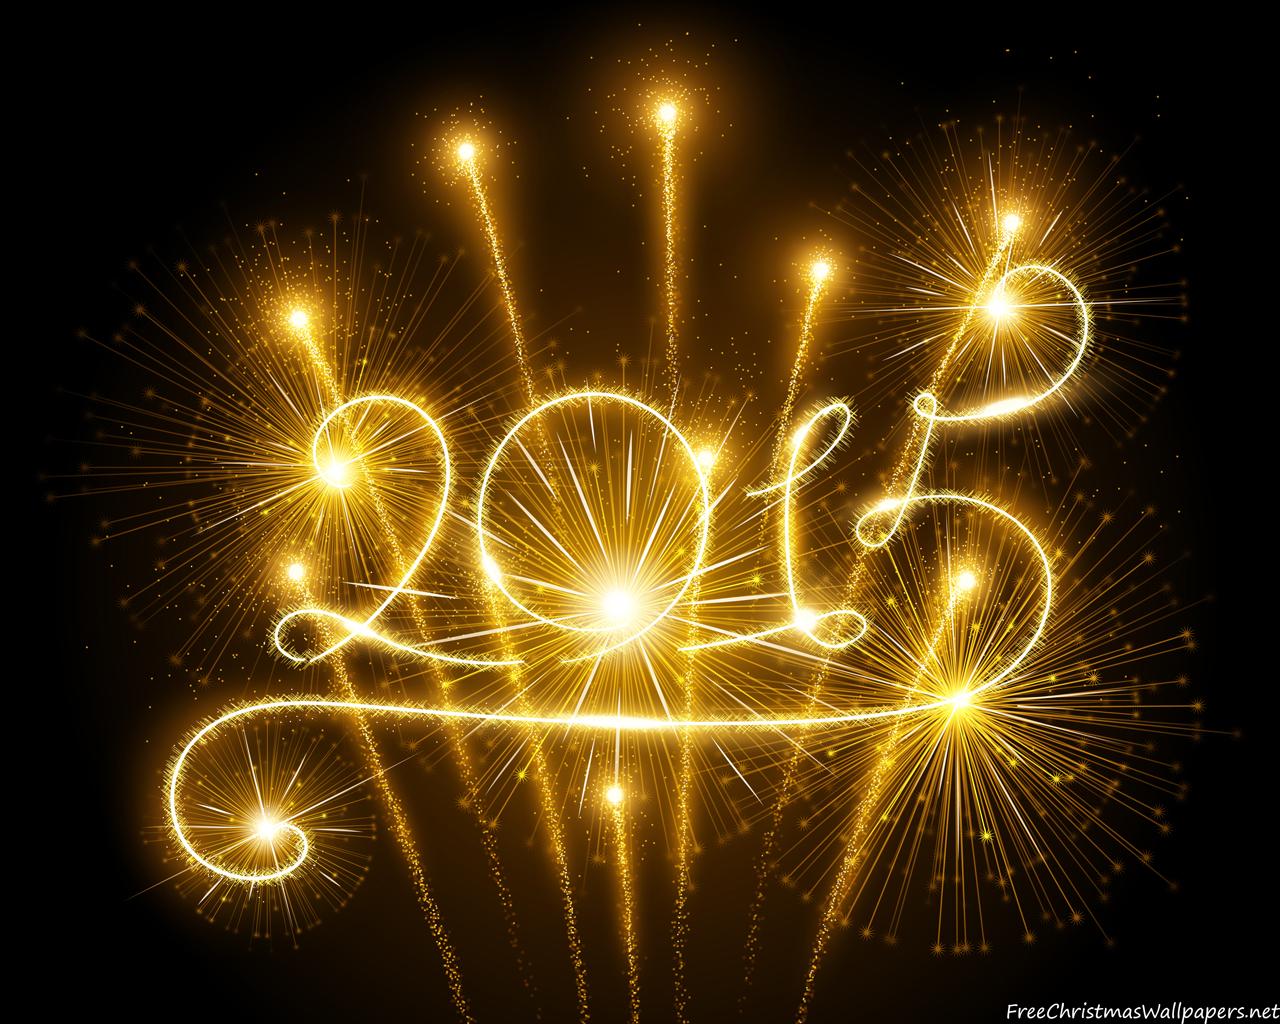 Download Happy New Year 2015 1600x1200 1920x1080 2560x1600 1280x1024